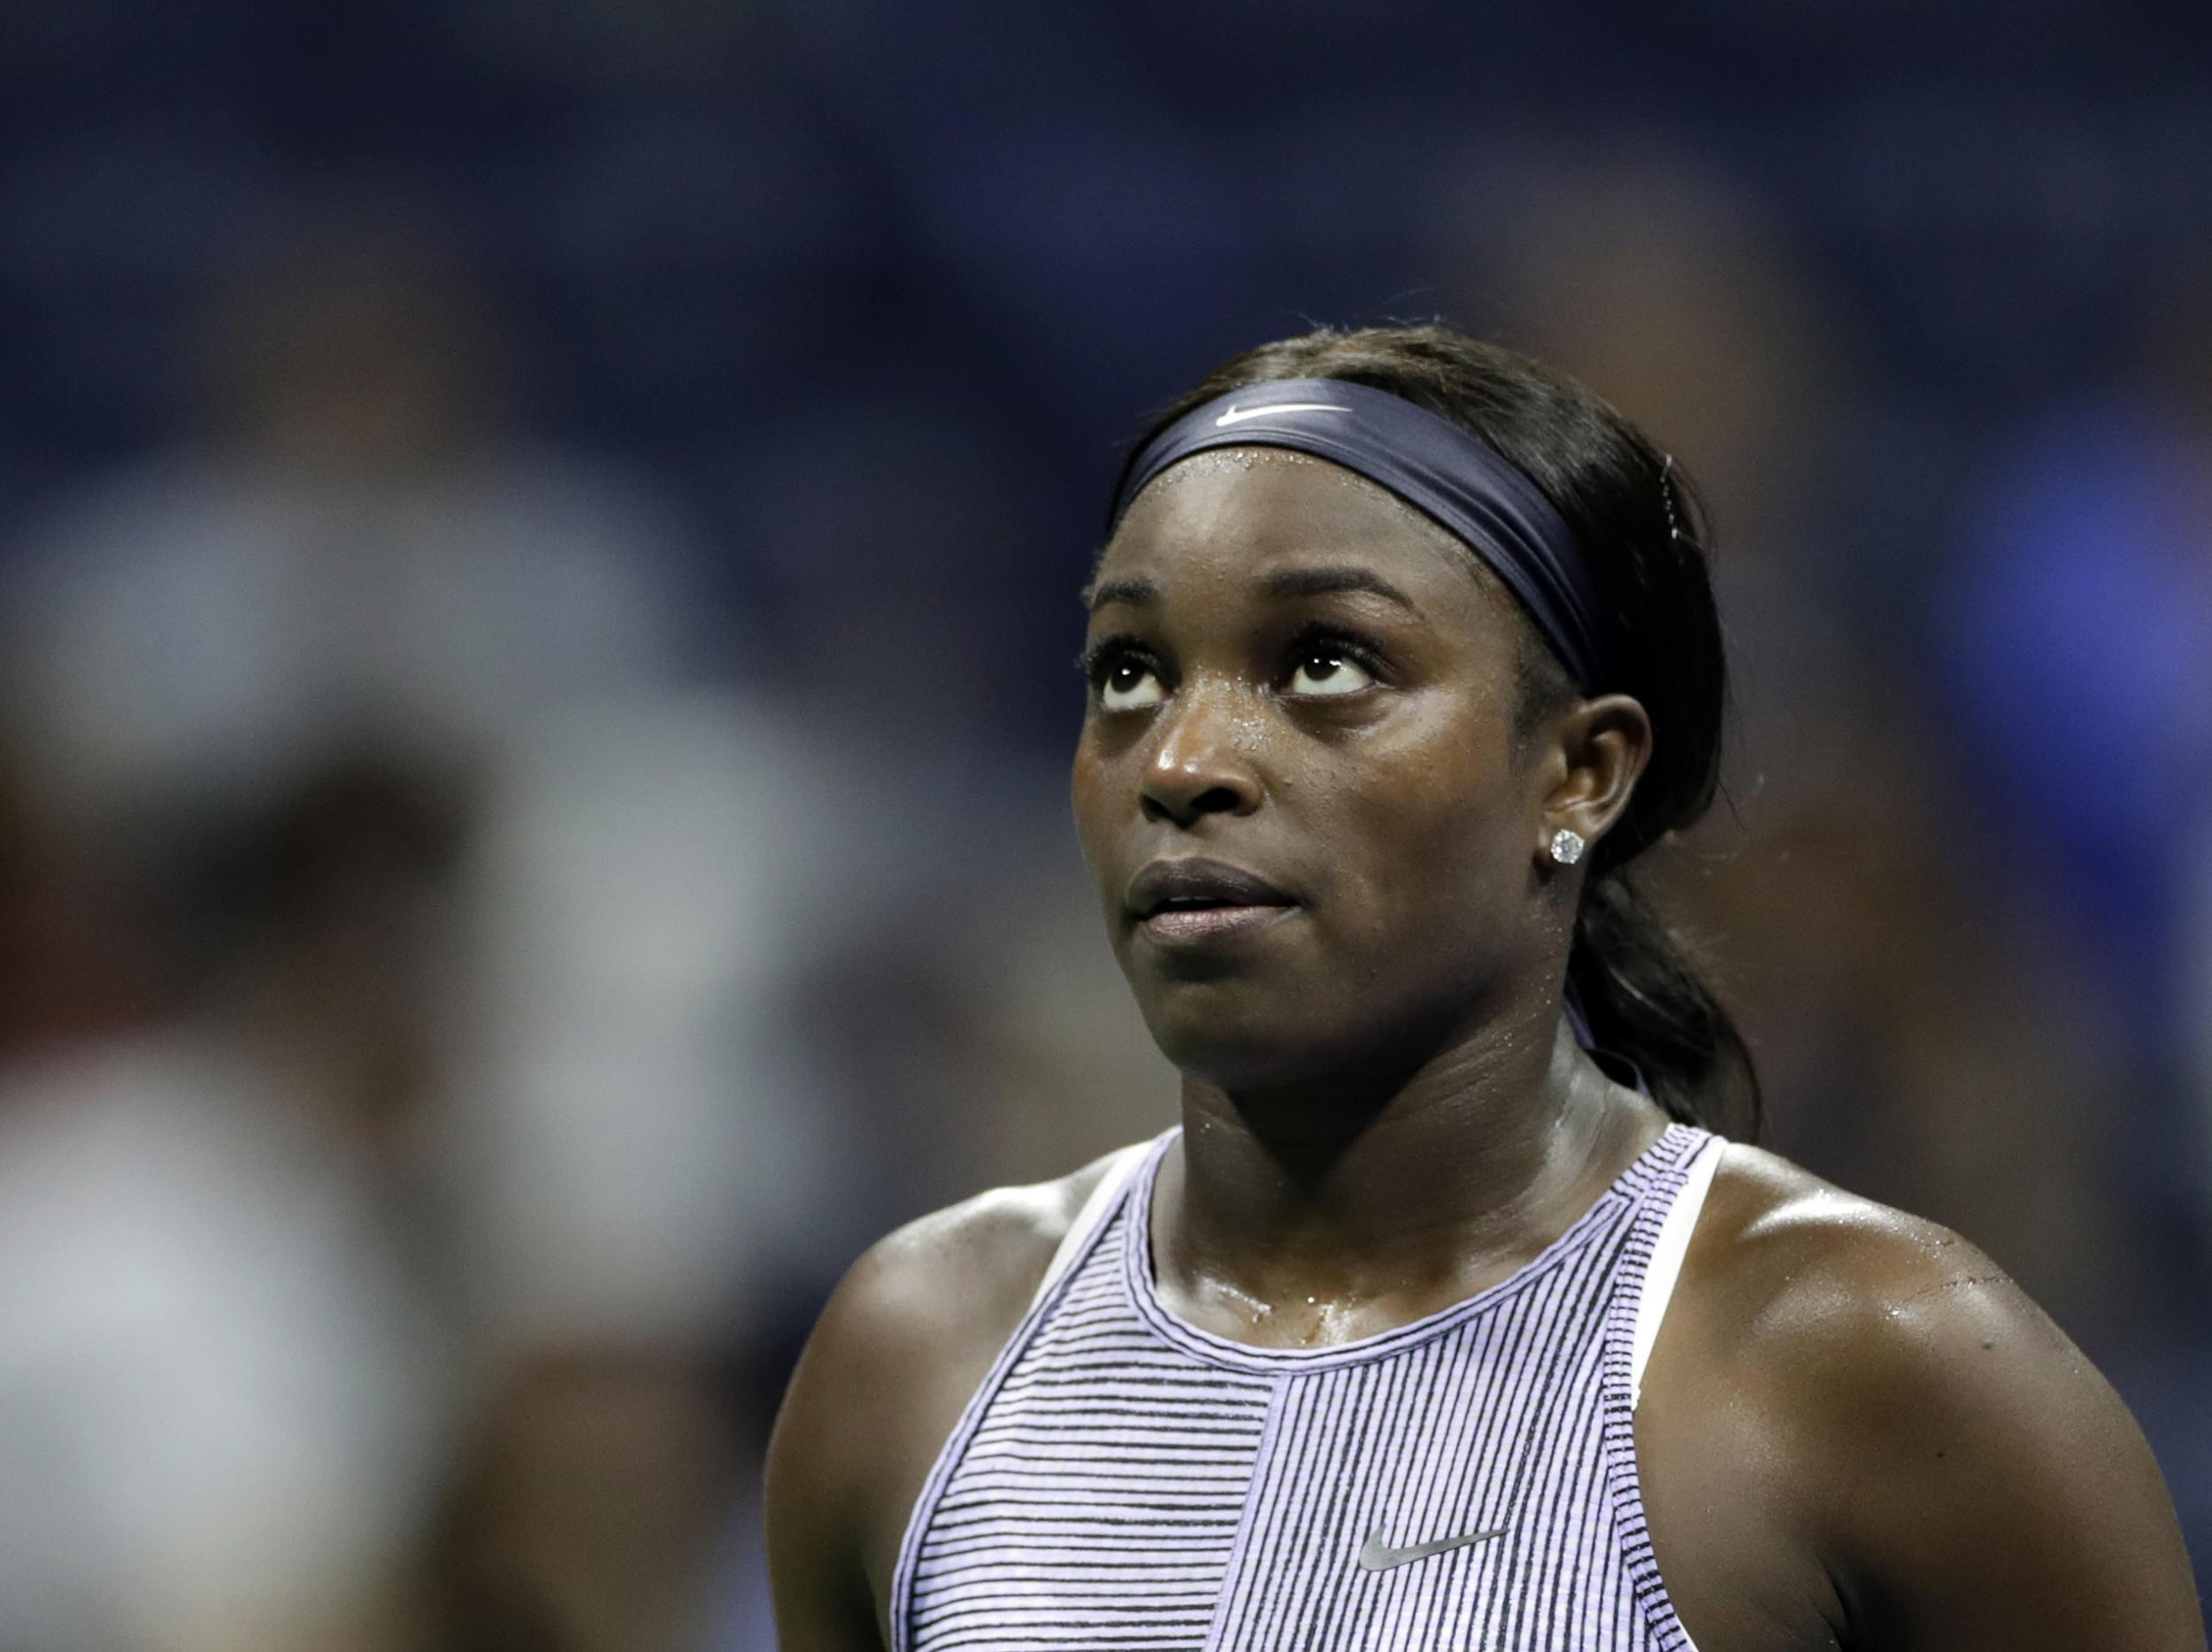 US Open 2019: Former champion Sloane Stephens stunned by Russian qualifier Anna Kalinskaya